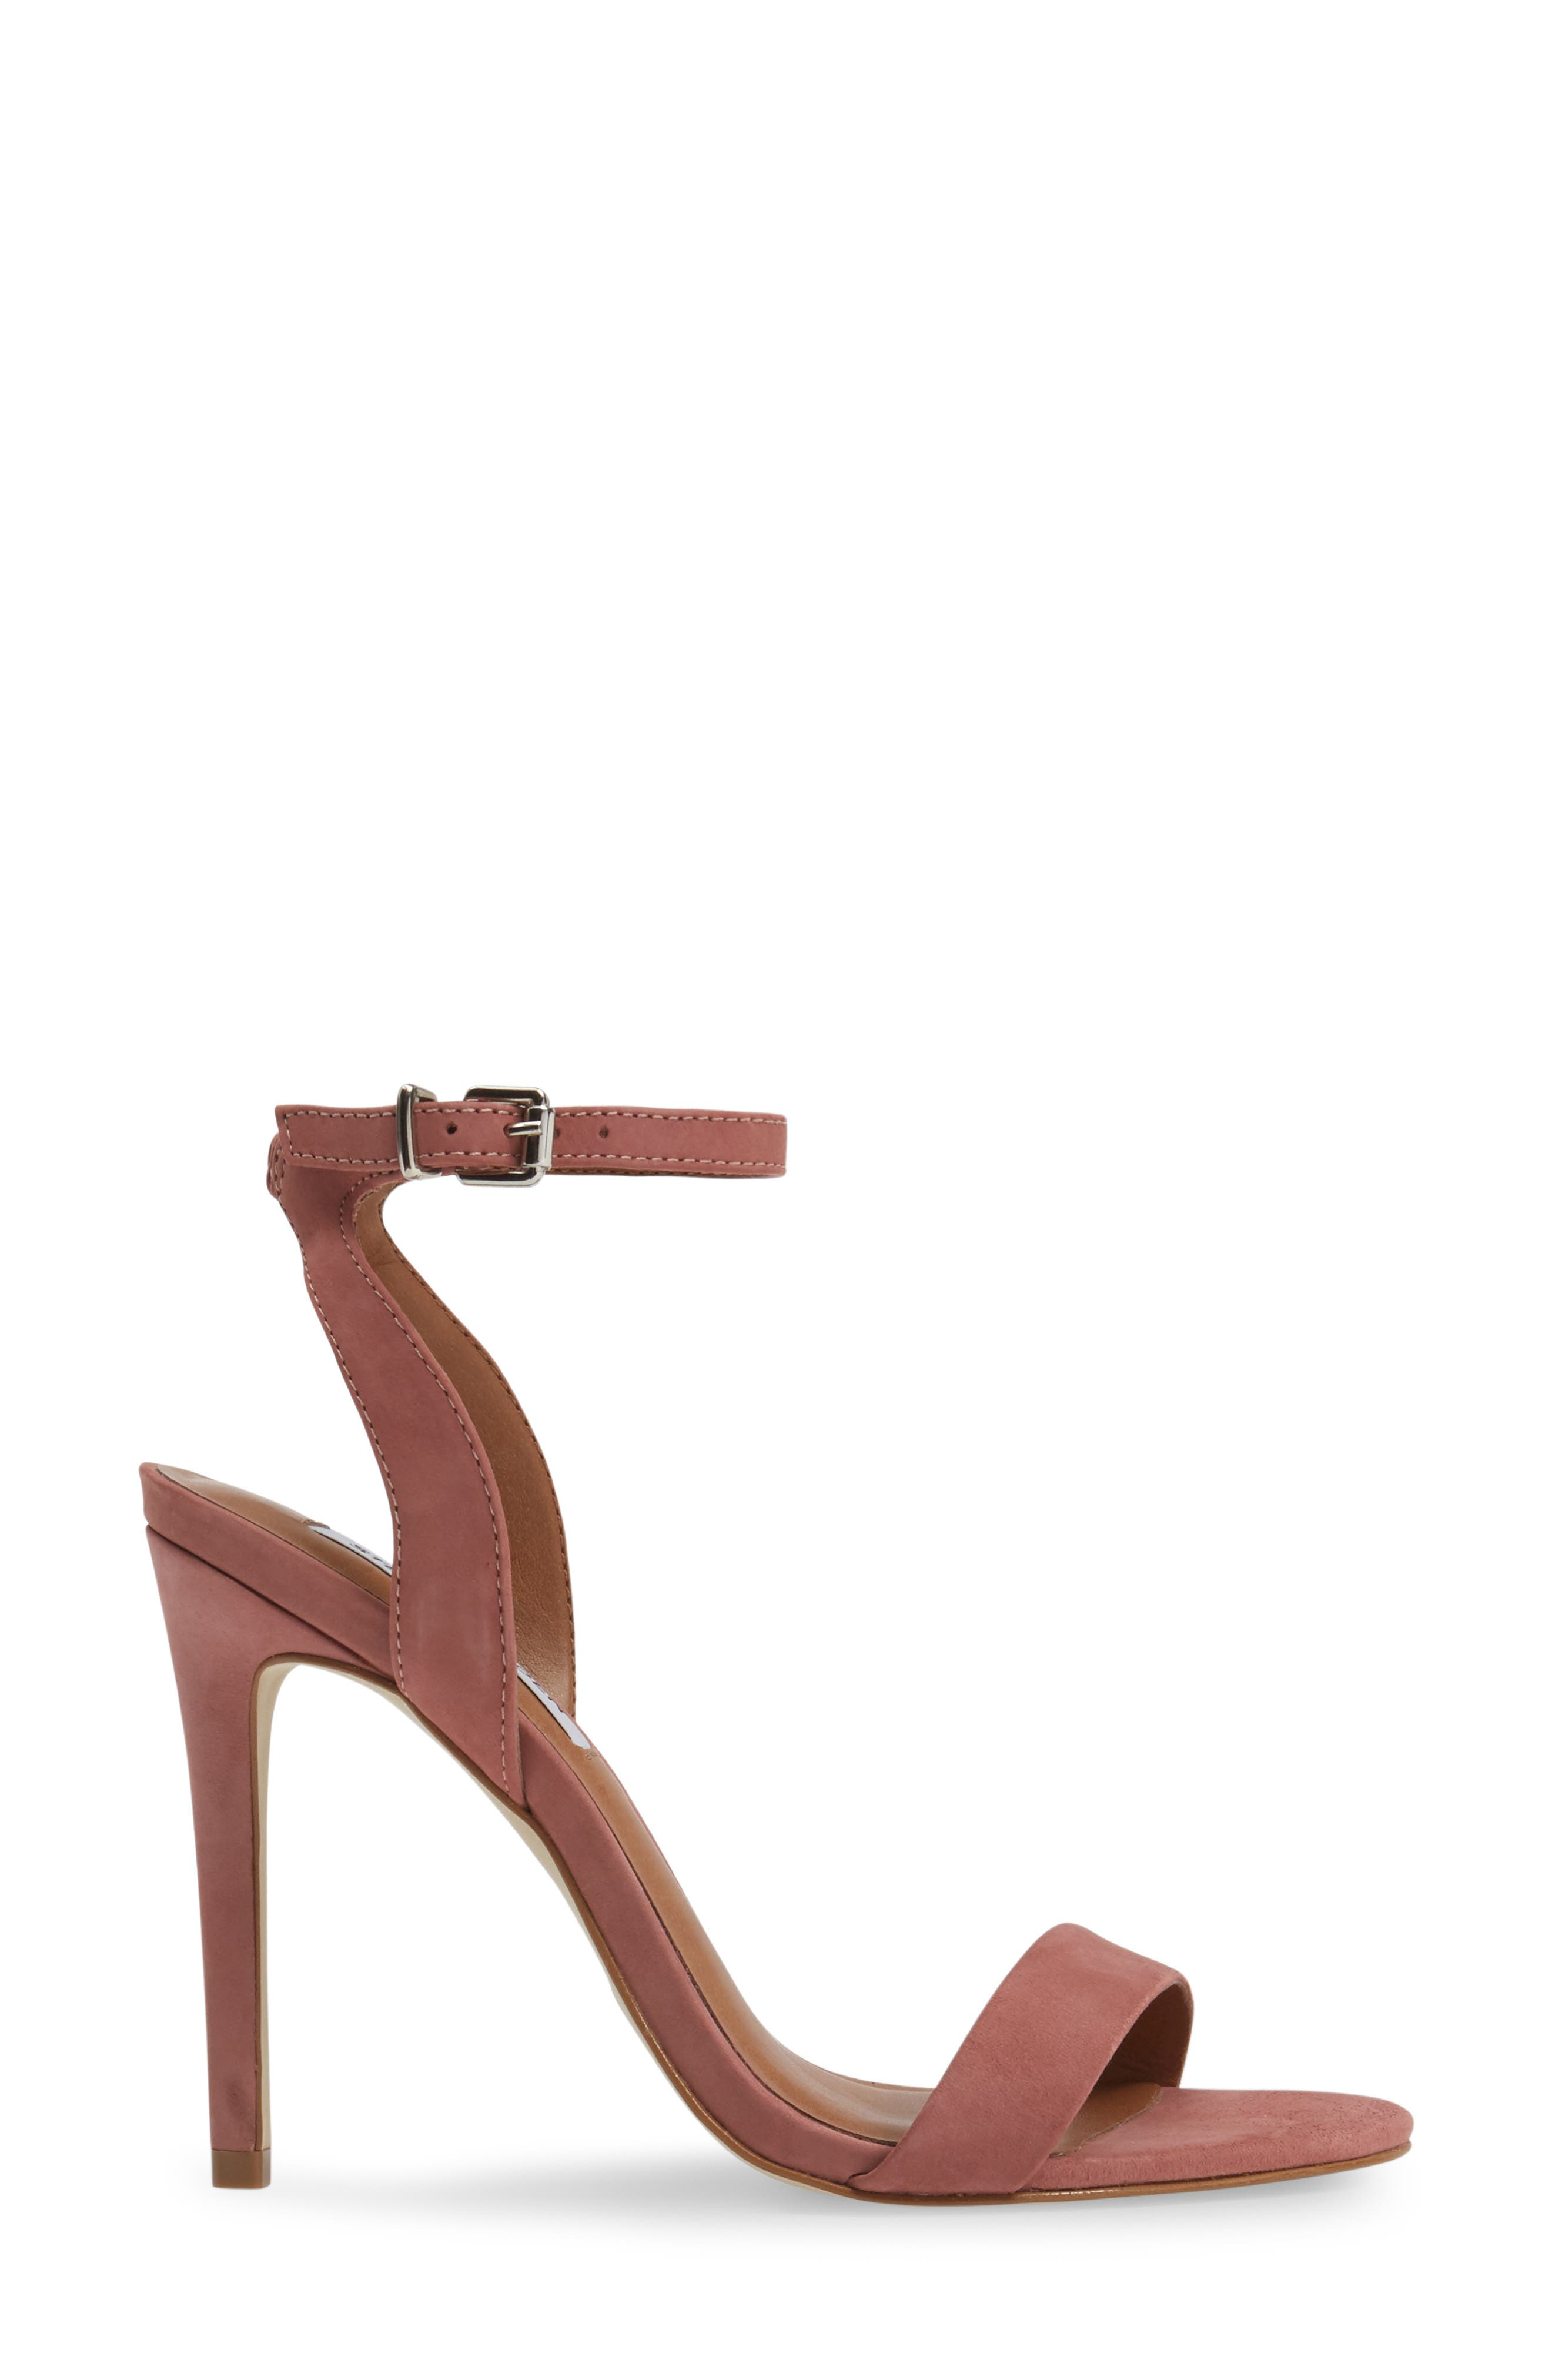 Landen Ankle Strap Sandal,                             Alternate thumbnail 48, color,